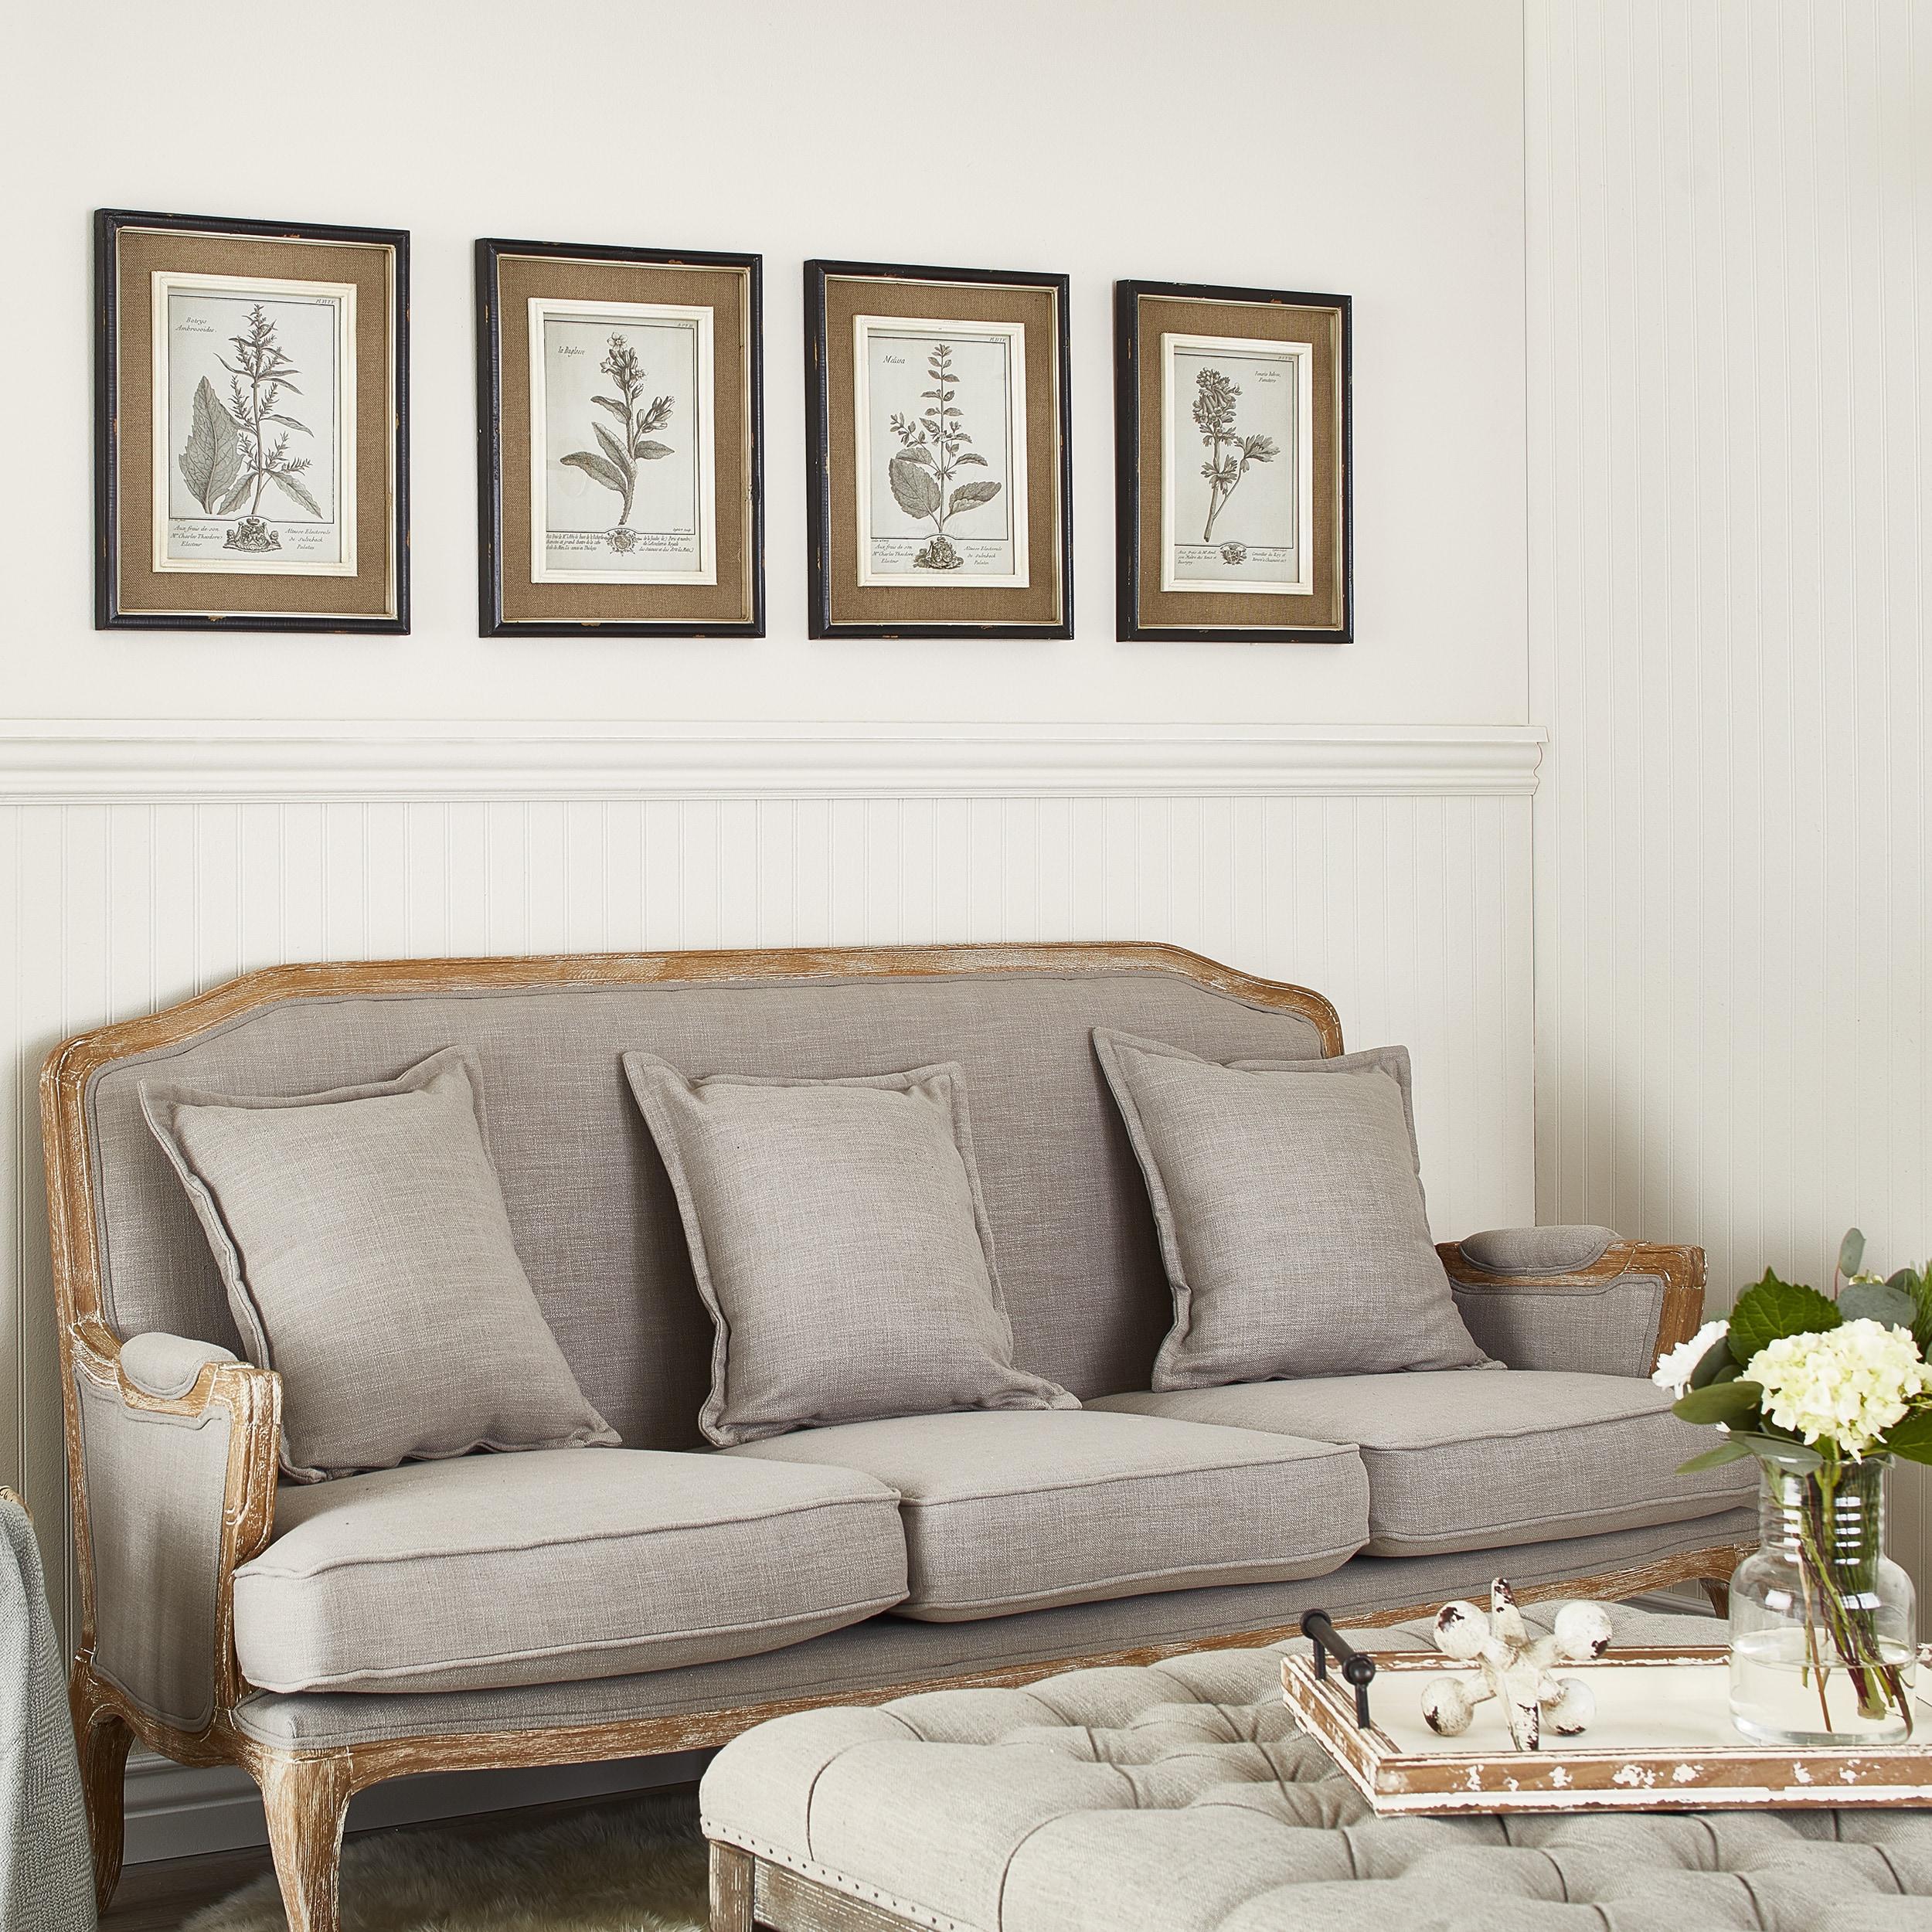 Shop Uttermost Casual Grey Study Framed Art (Set of 4) - Free ...